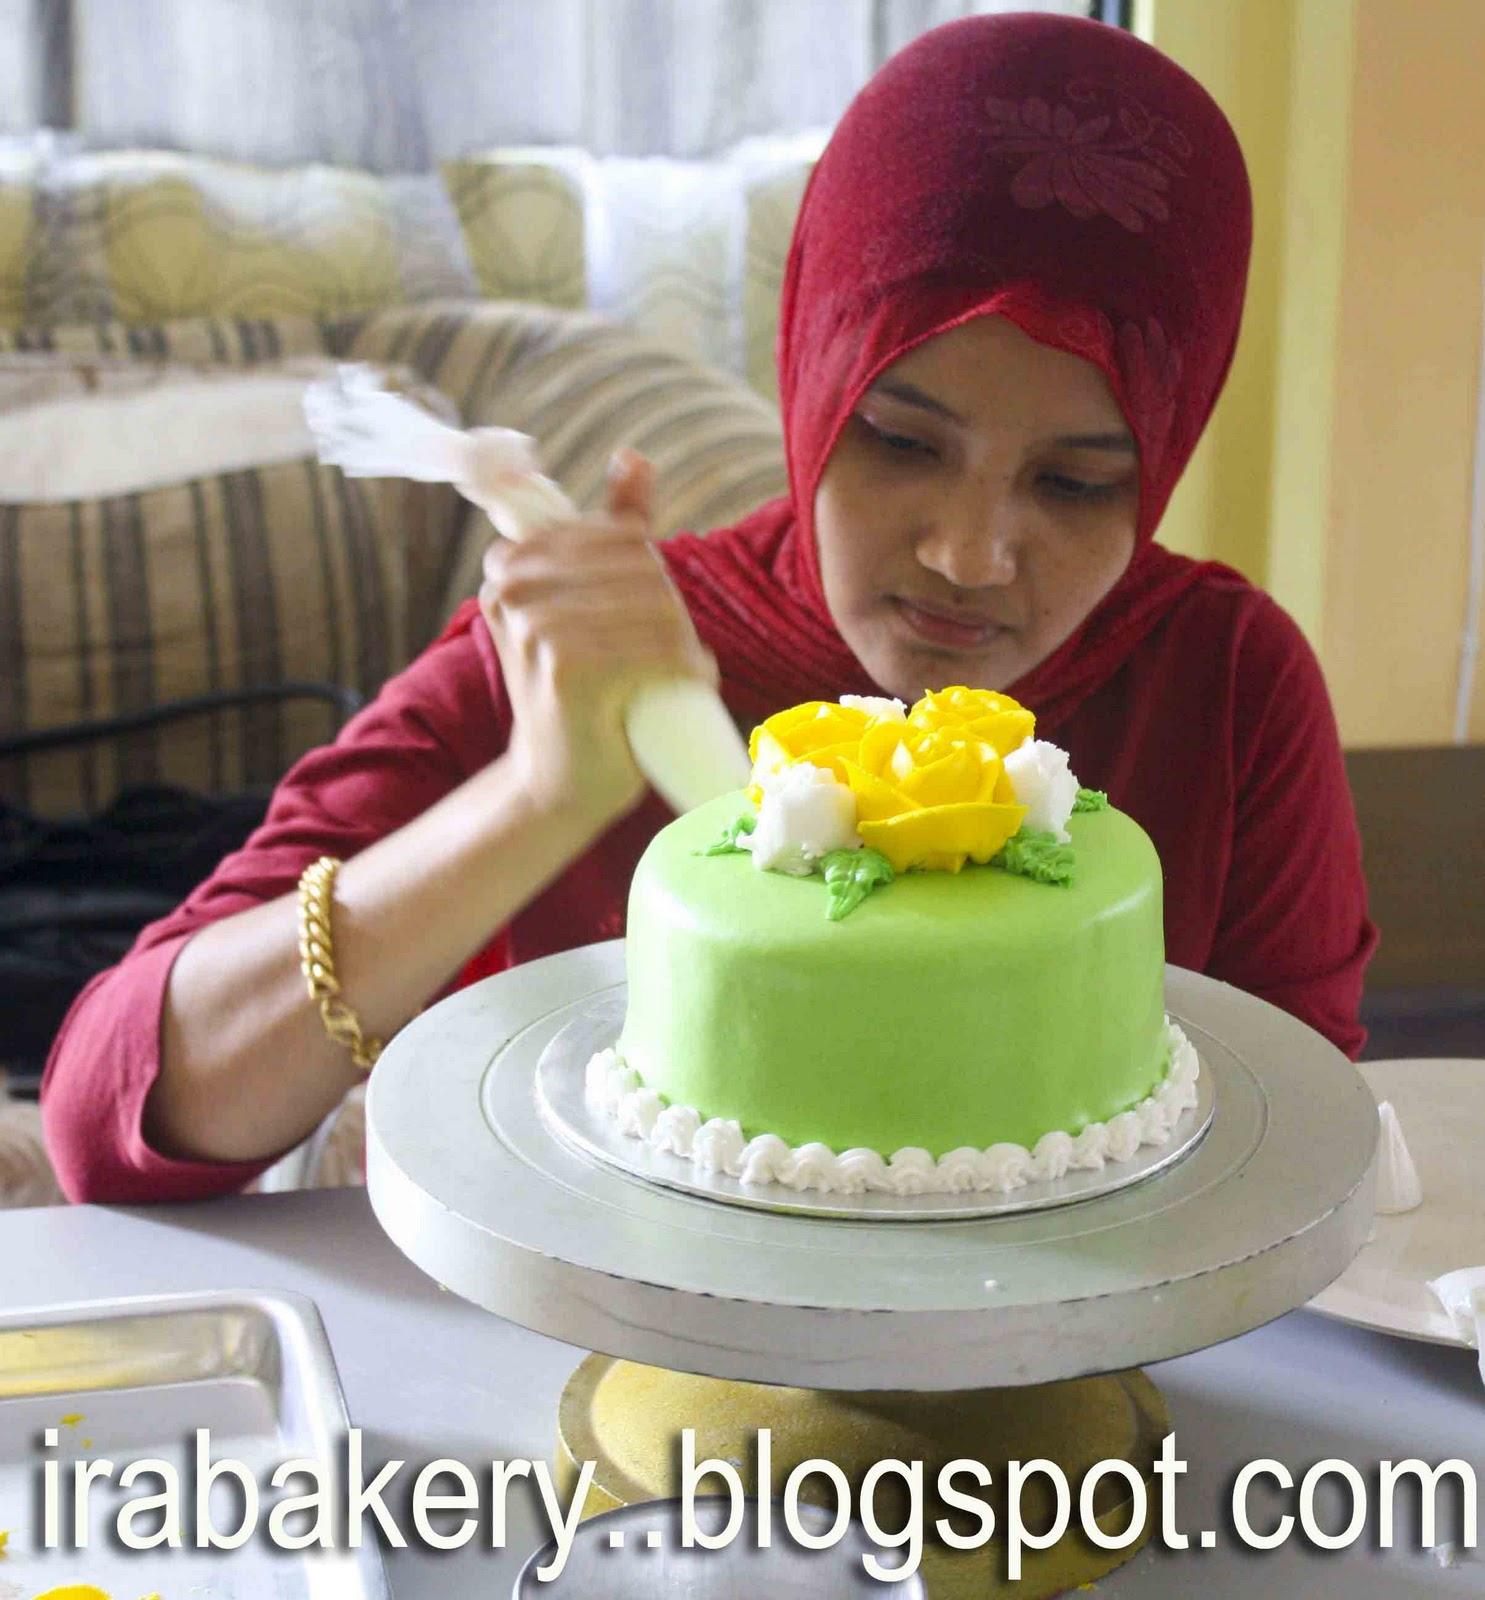 Wedding Cake Classes: Deco Cakes, Cupcakes, Cheese Cake & Kek Lapis Sarawak In